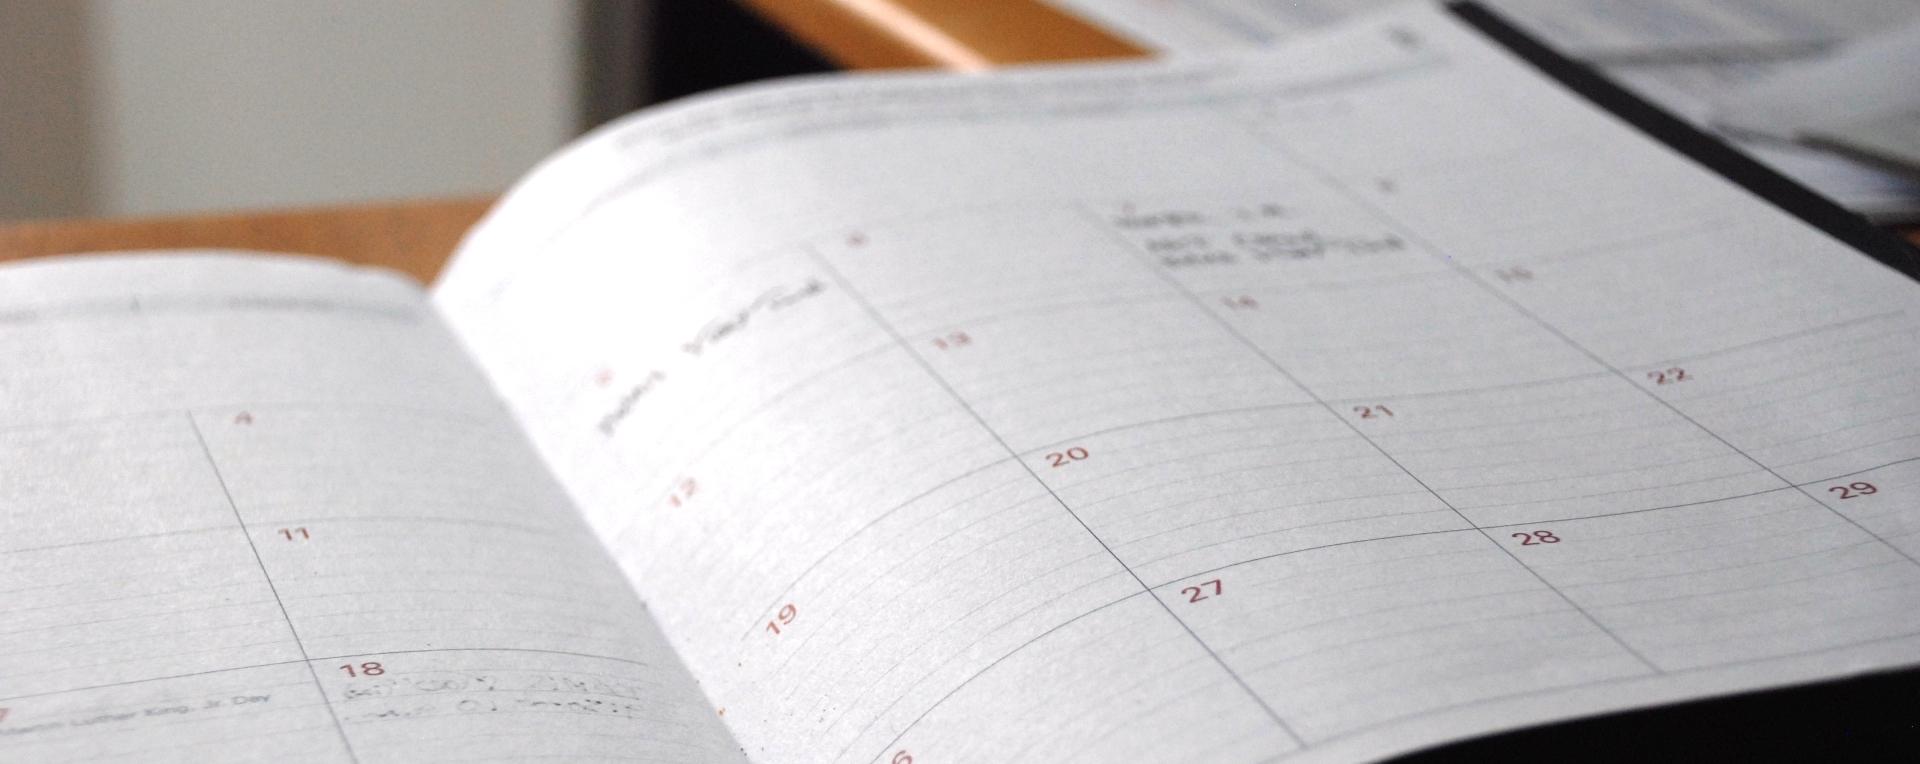 Kalendar, Events, unsplash.com, Eric Rothermel